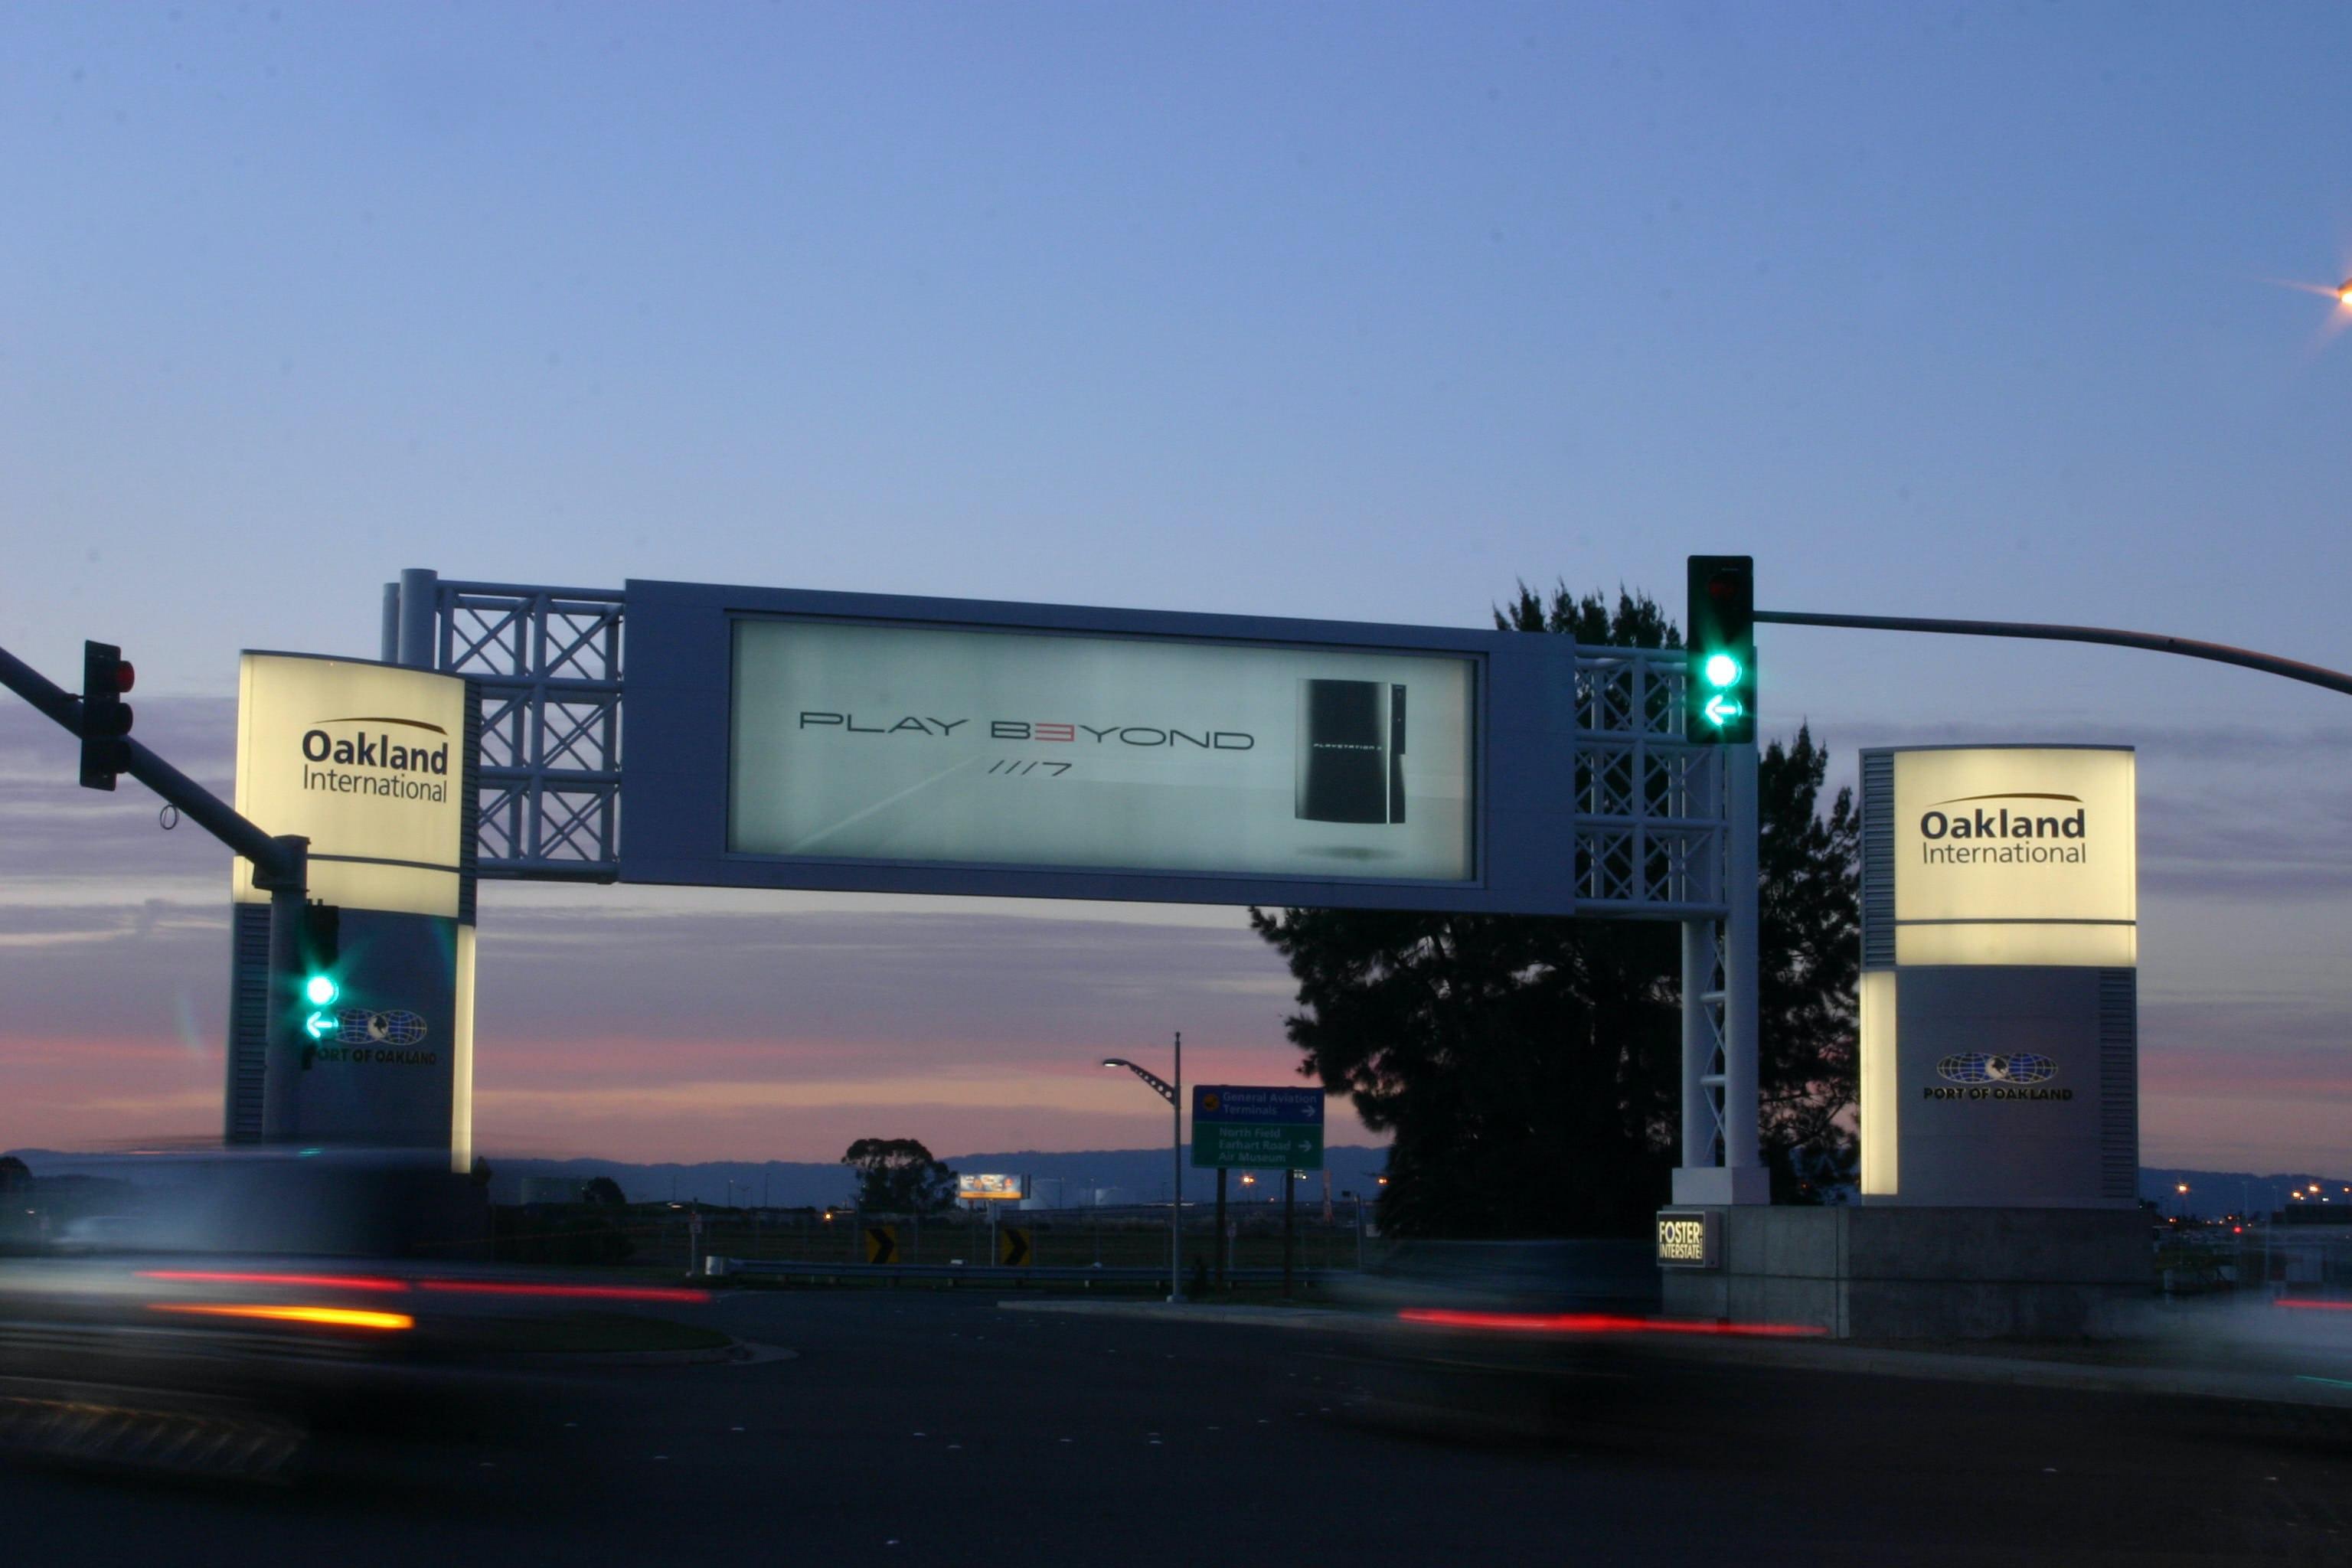 Oakland airport 2 print